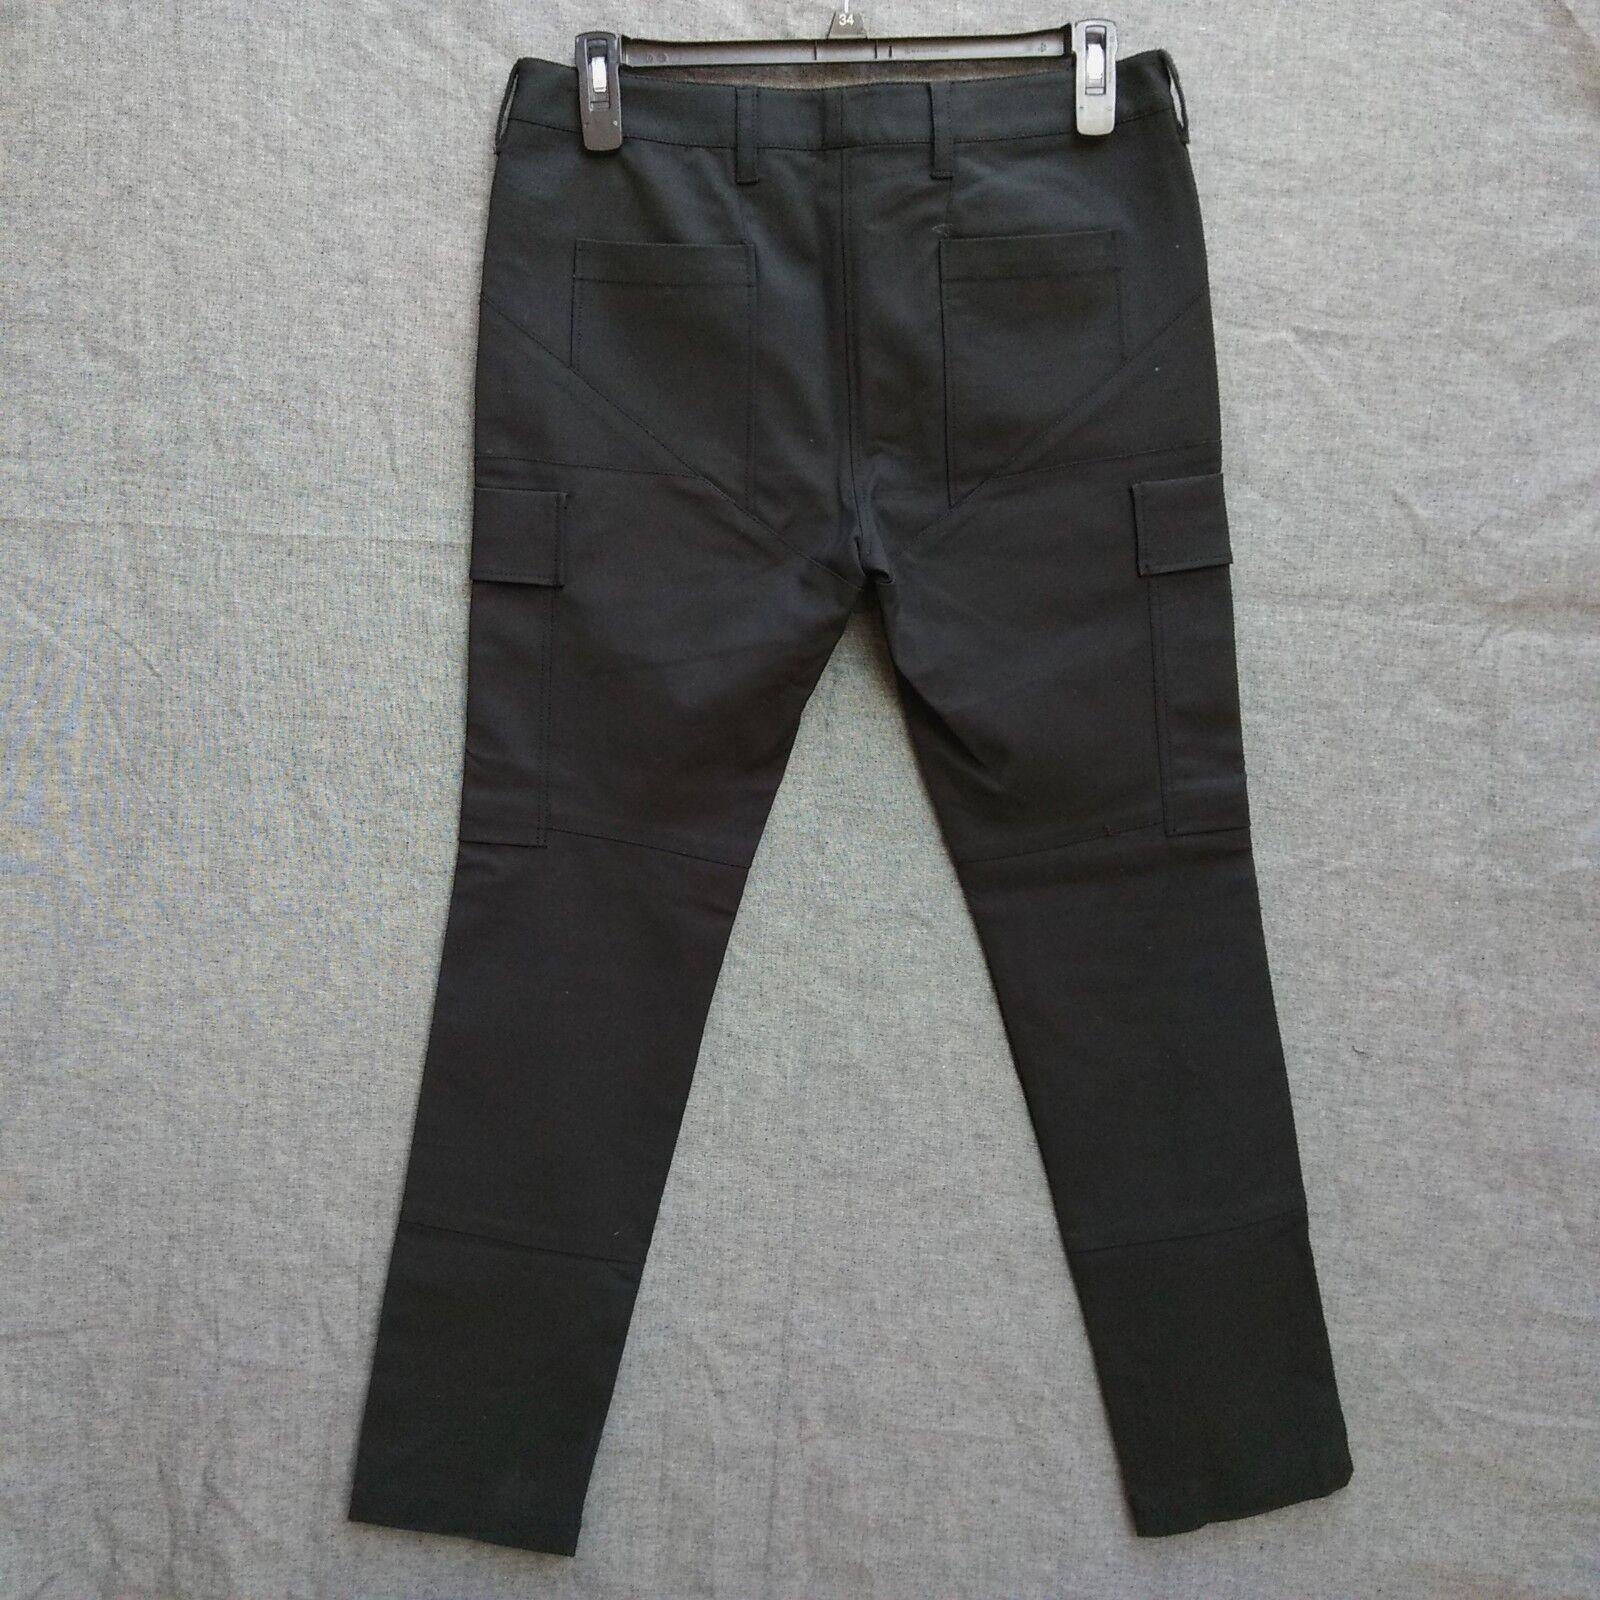 3.1 Phillip Lim Pantalon Cargo schwarz Größe 10